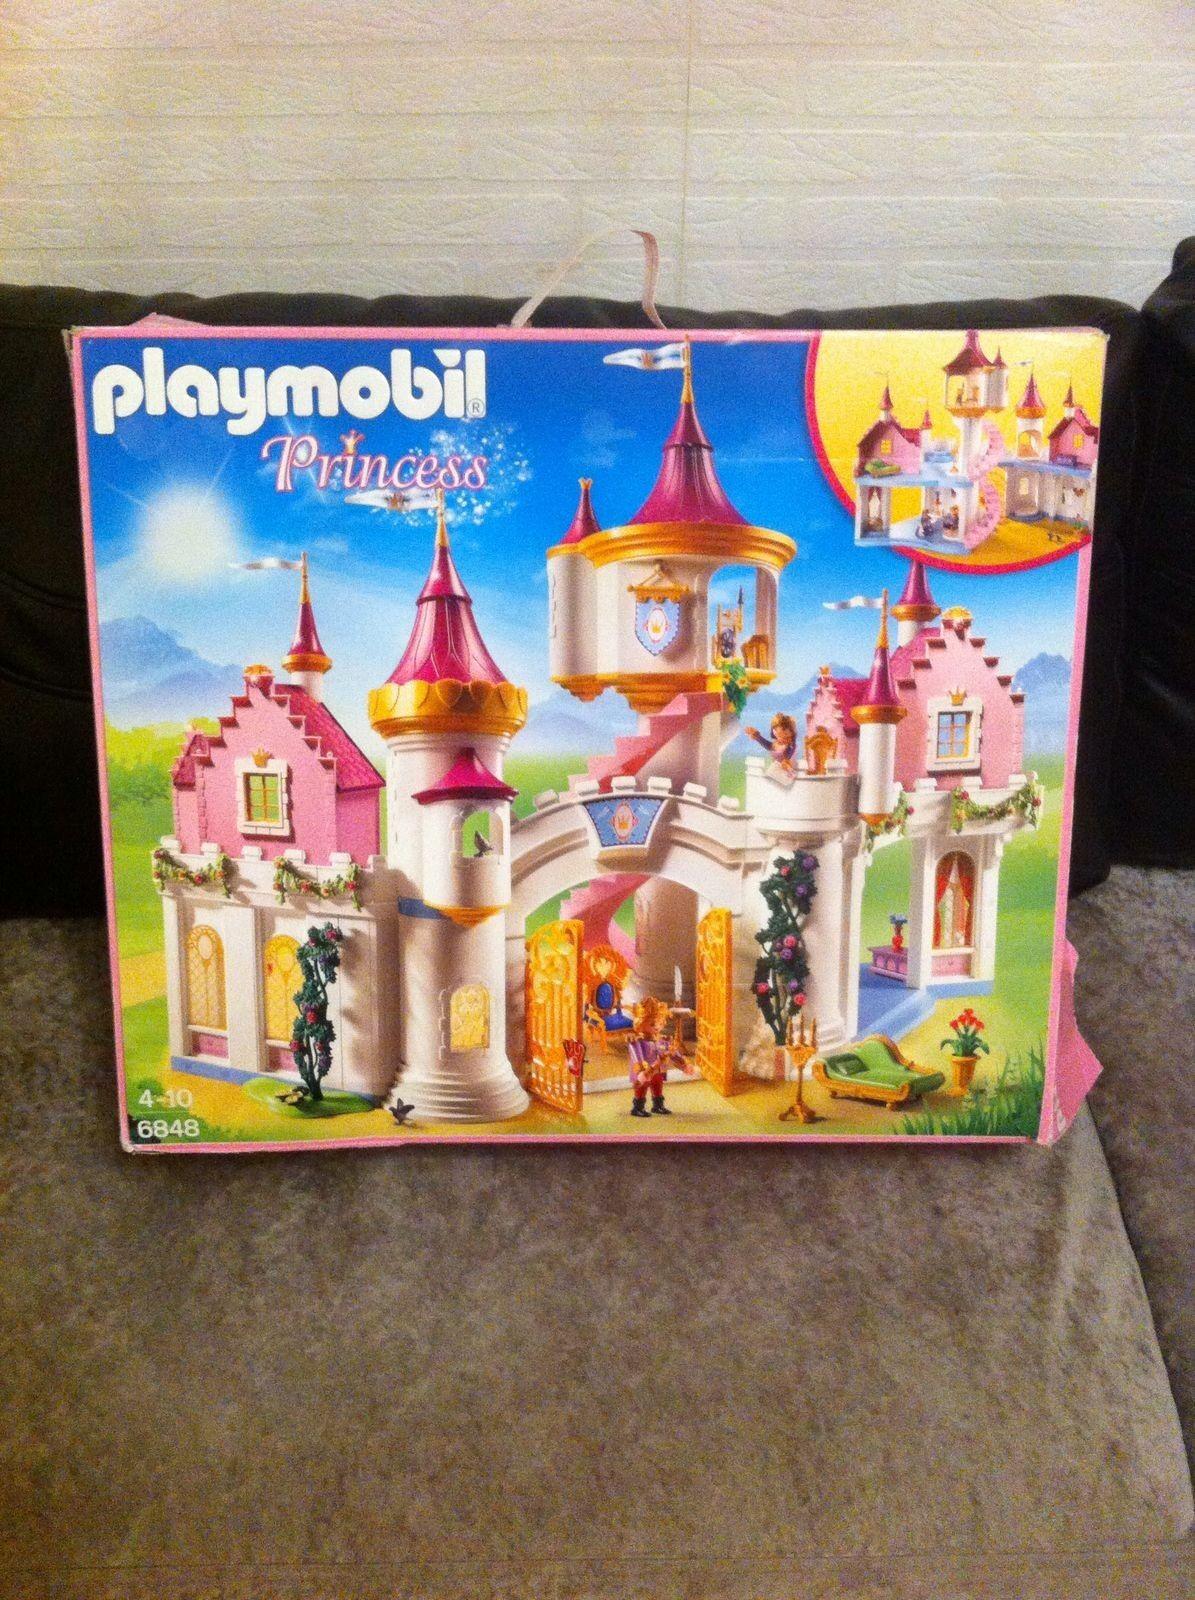 PLAYMOBIL PRINCESS   PRINZESSINNE SCHLOß 6848